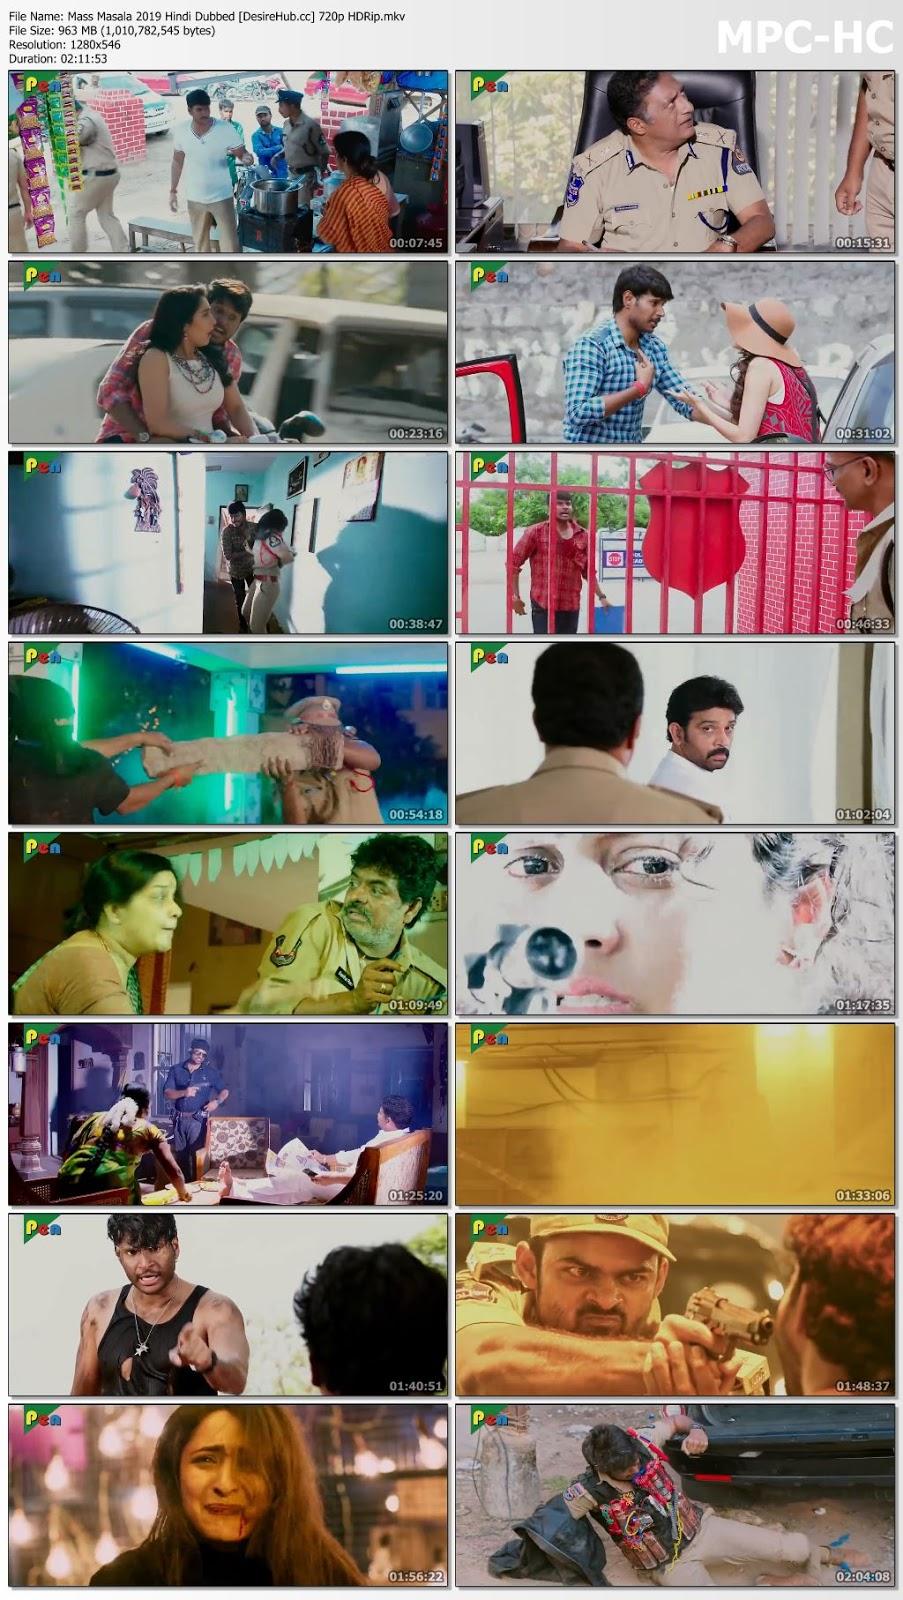 Mass Masala 2019 Hindi Dubbed 720p HDRip 950mb Desirehub